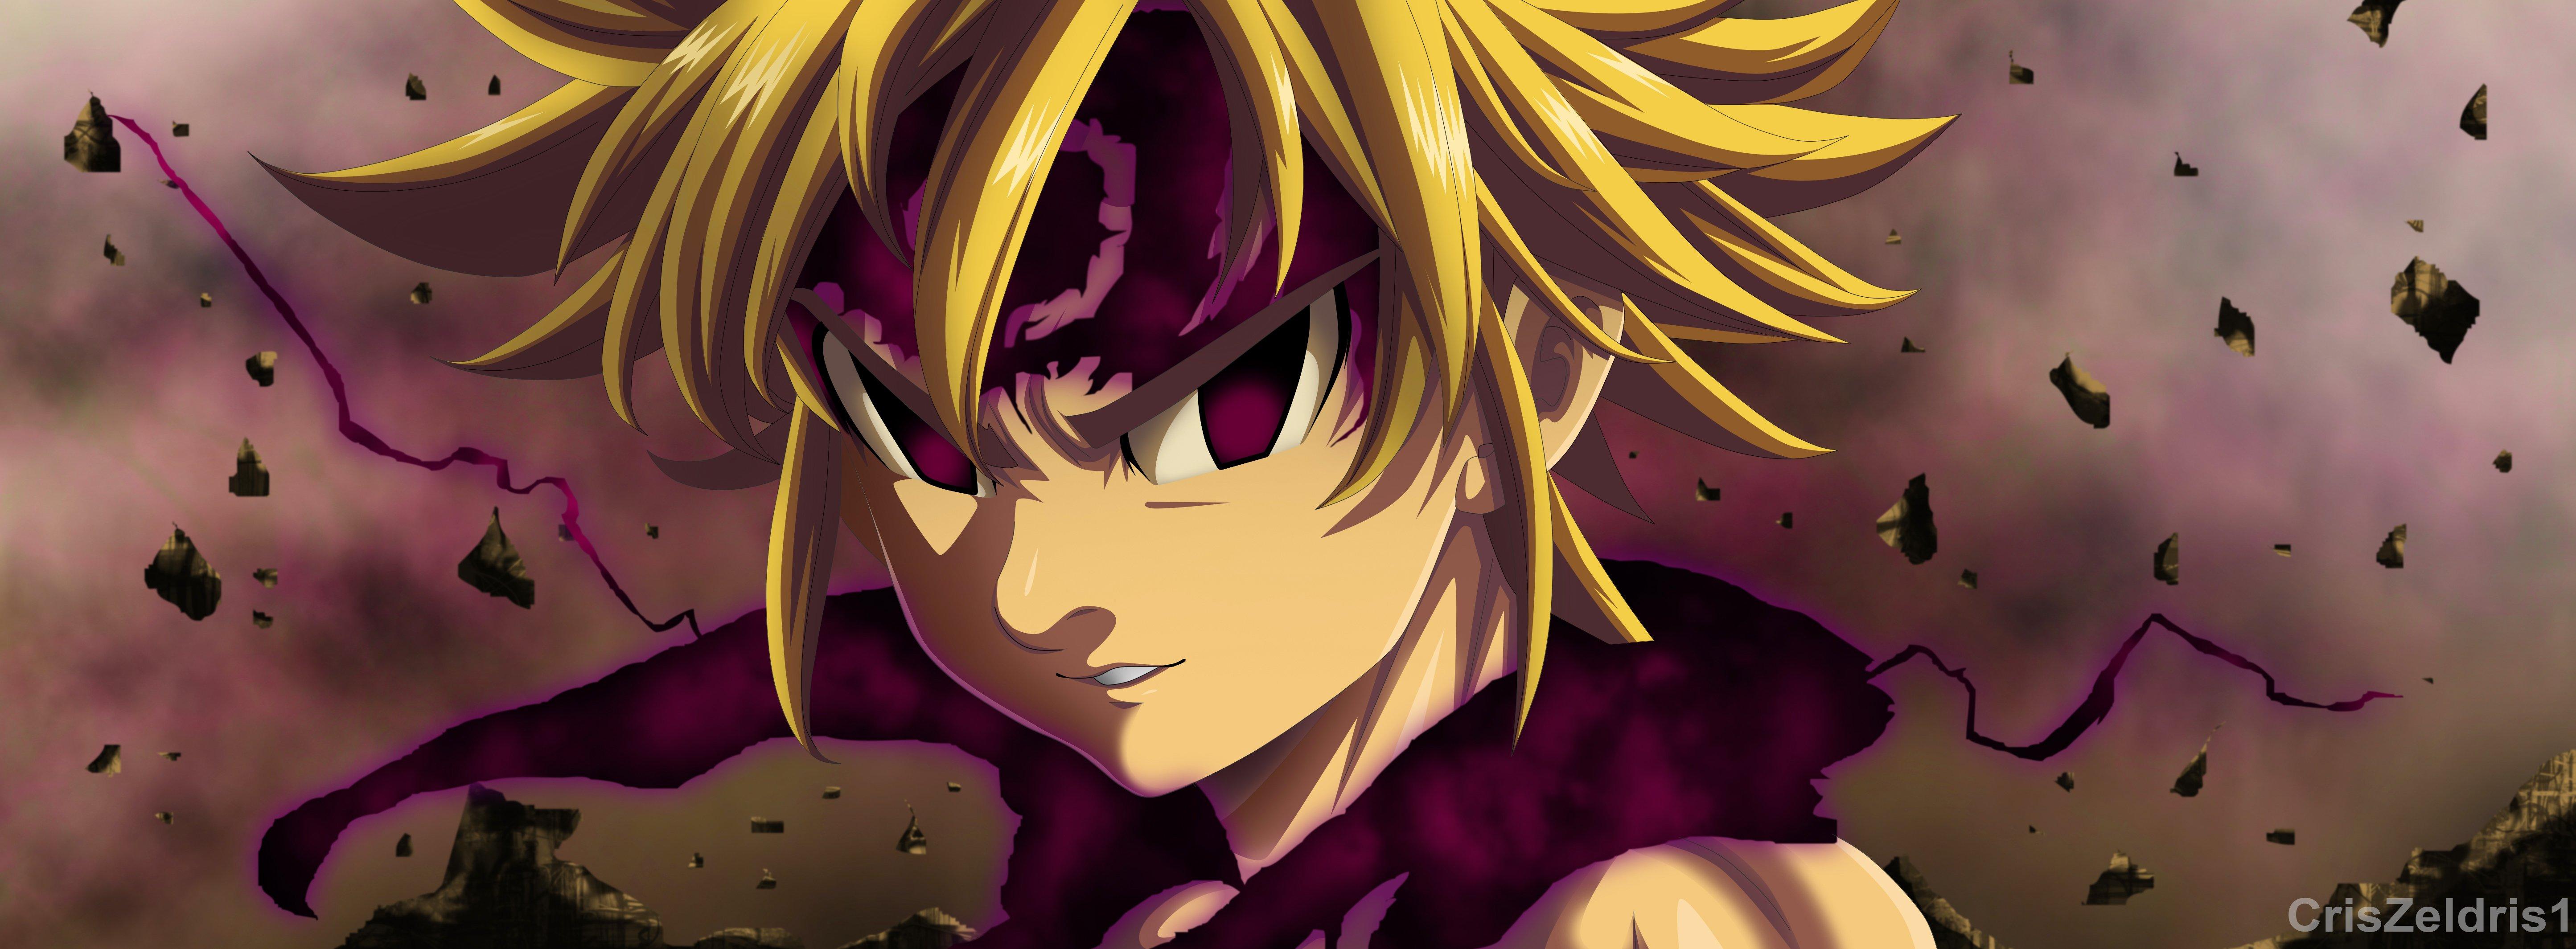 Fondos de pantalla Anime Meliodas de Los siete pecados capitales